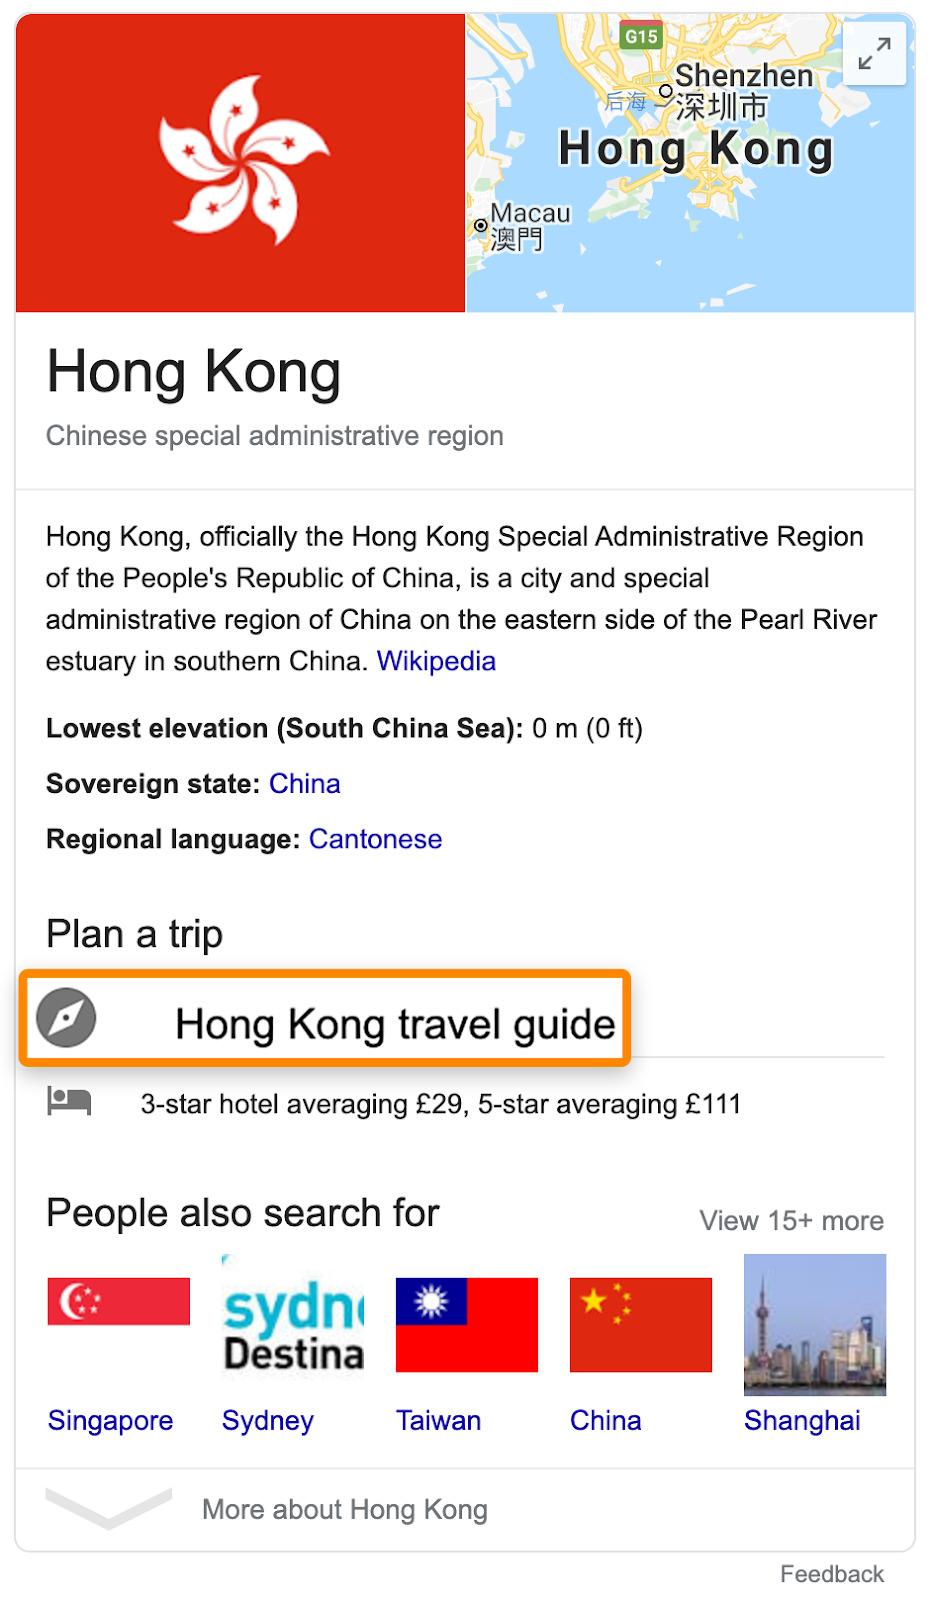 17 hong kong travel guide